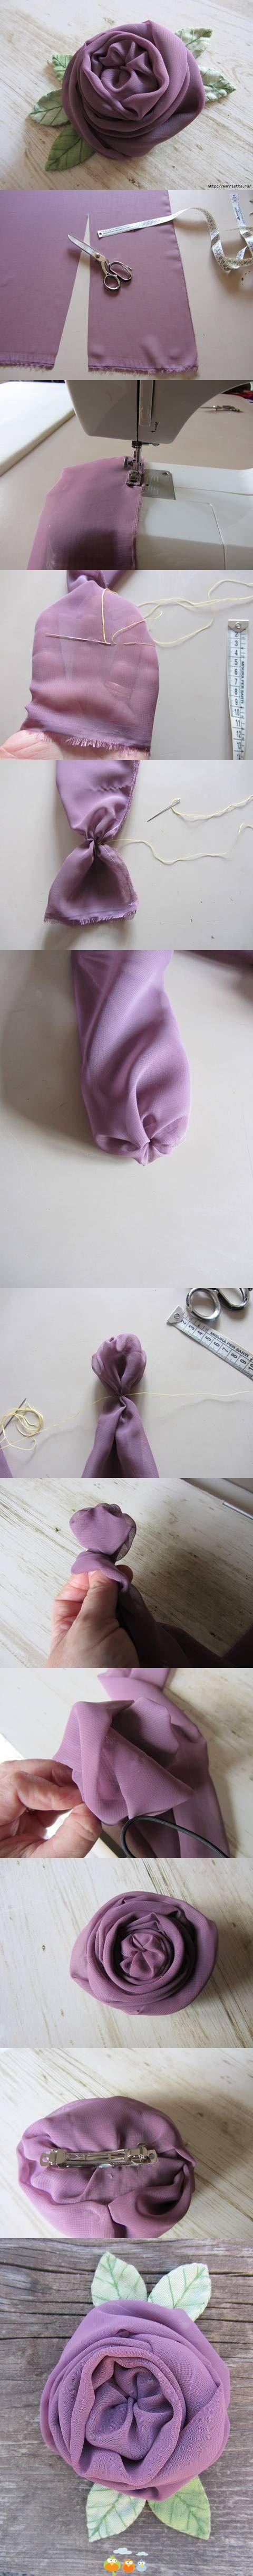 pretty rose tutorial